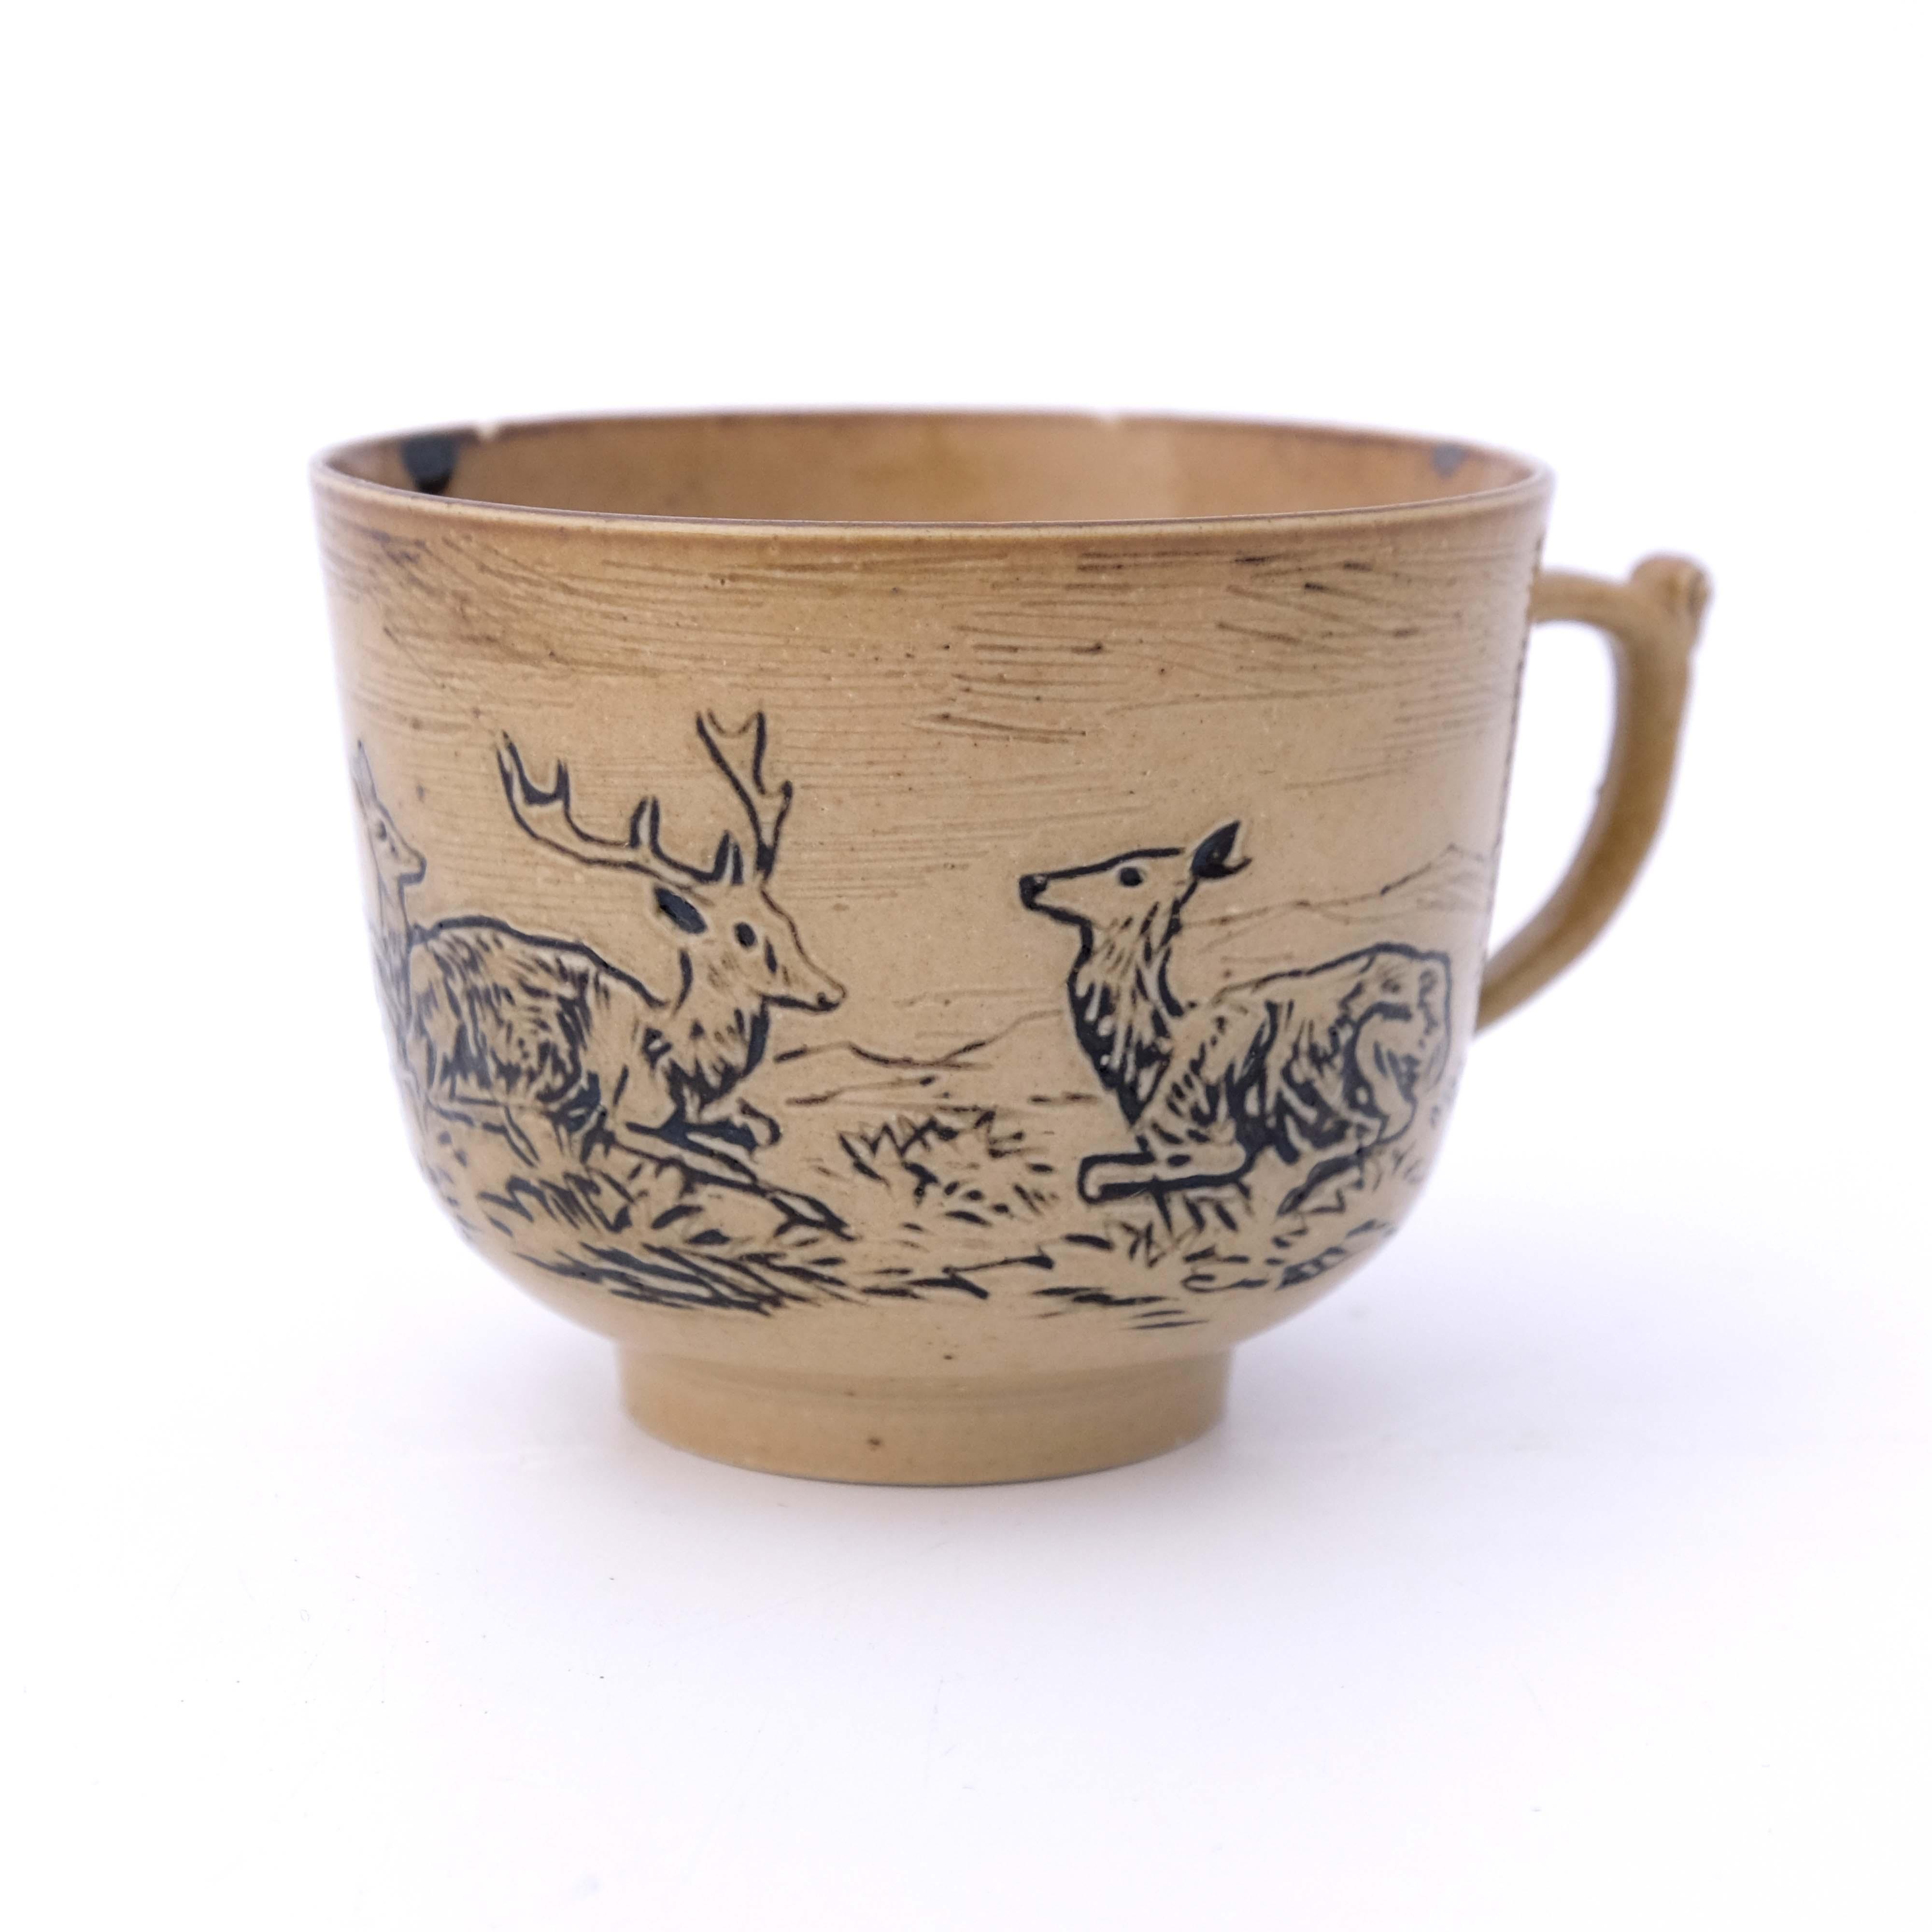 Hannah Barlow for Doulton Lambeth, a stoneware cof - Image 3 of 5